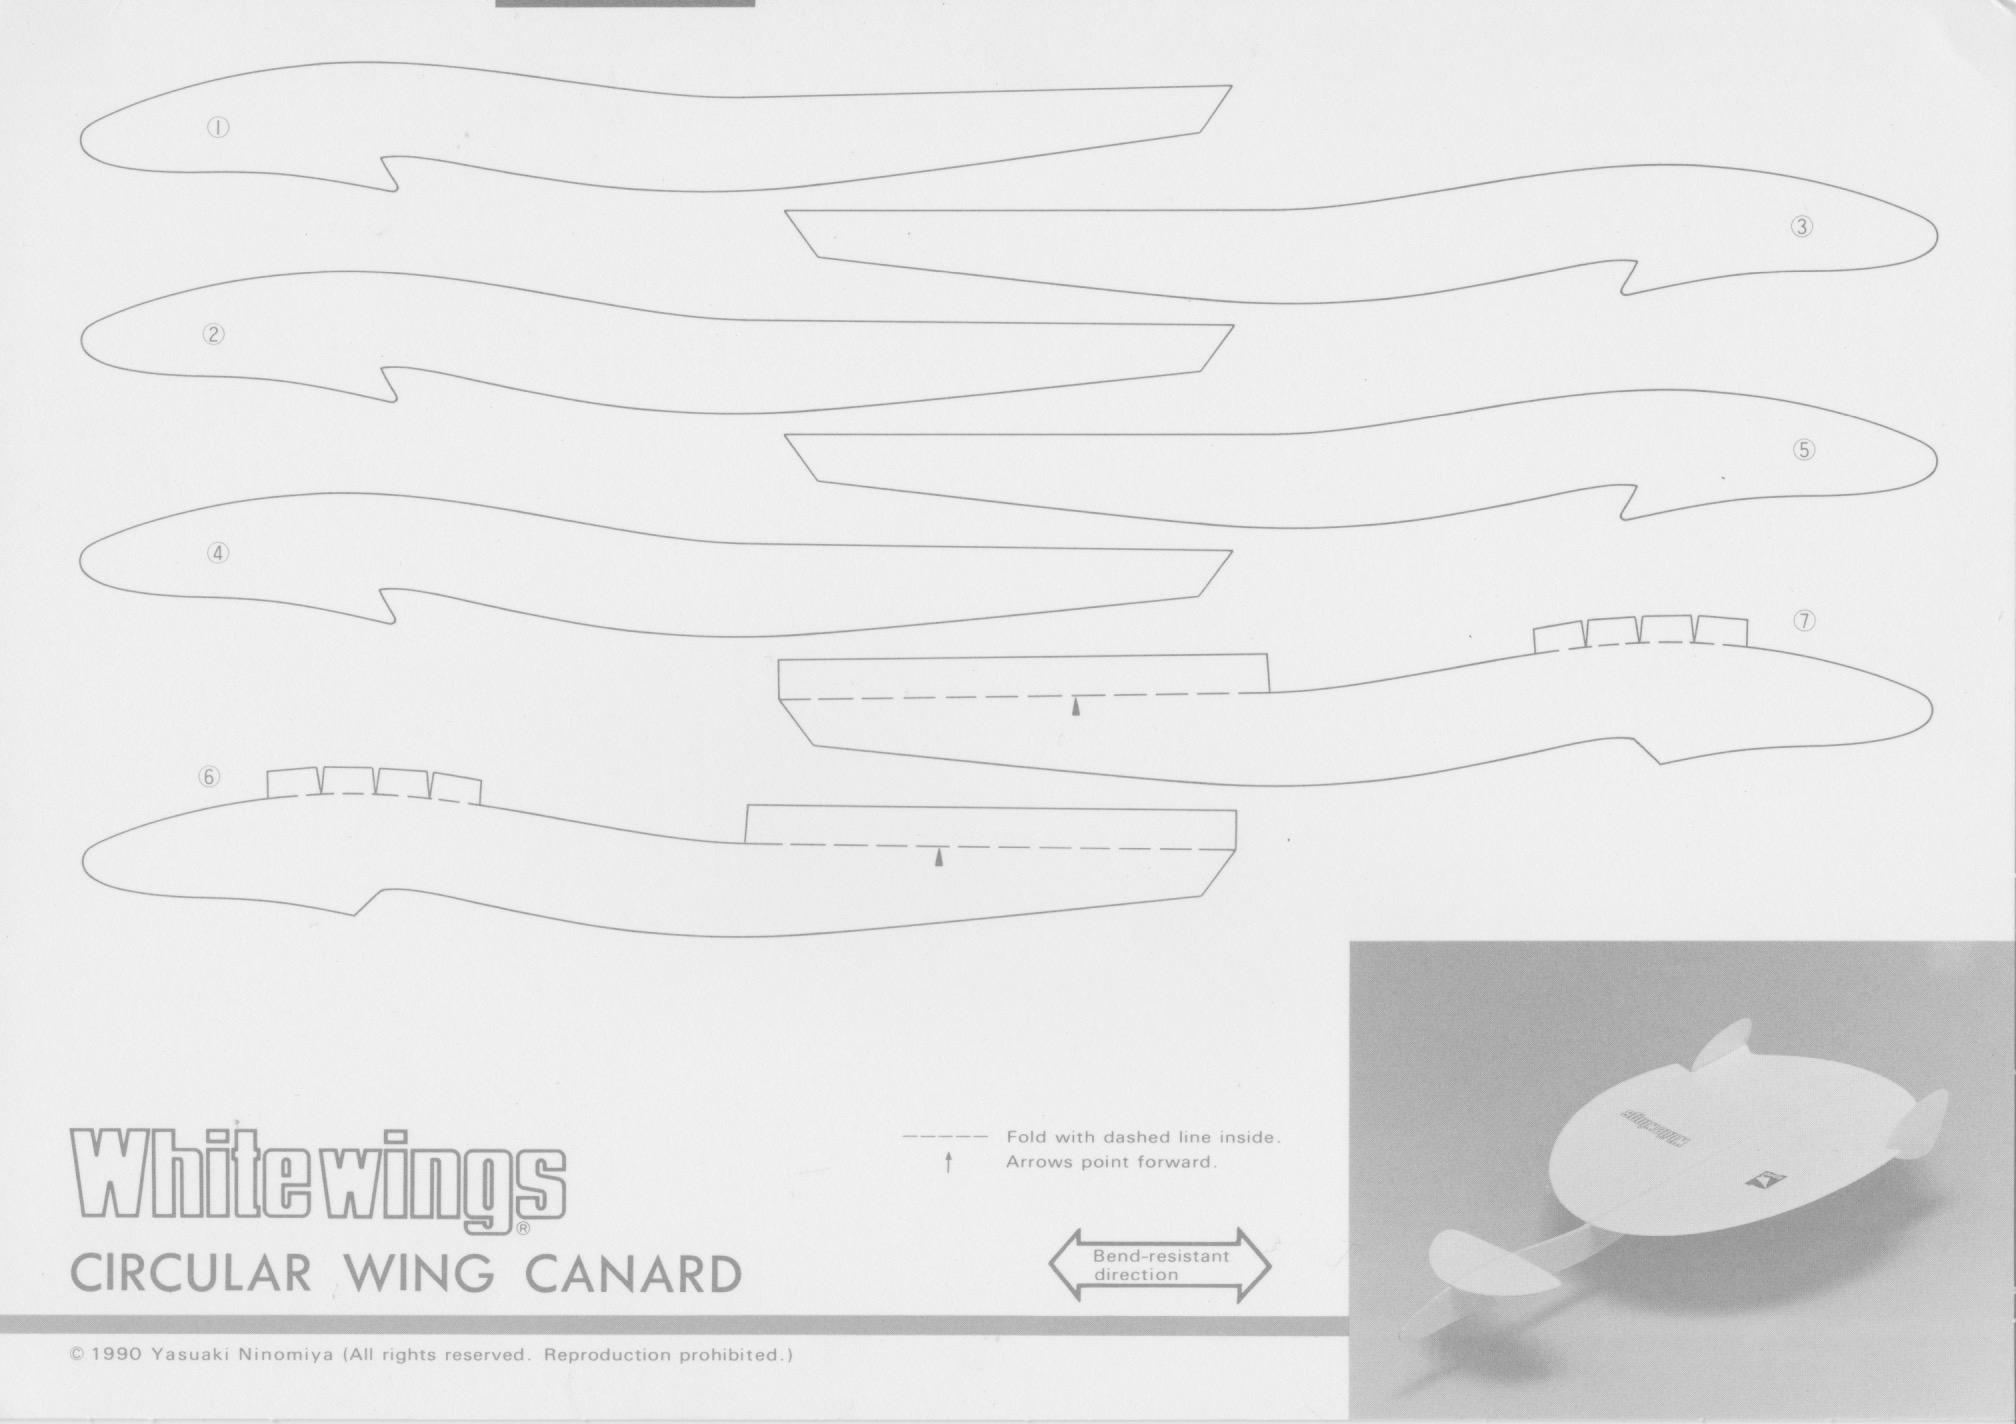 Circular_Wing_Canard_1.jpeg